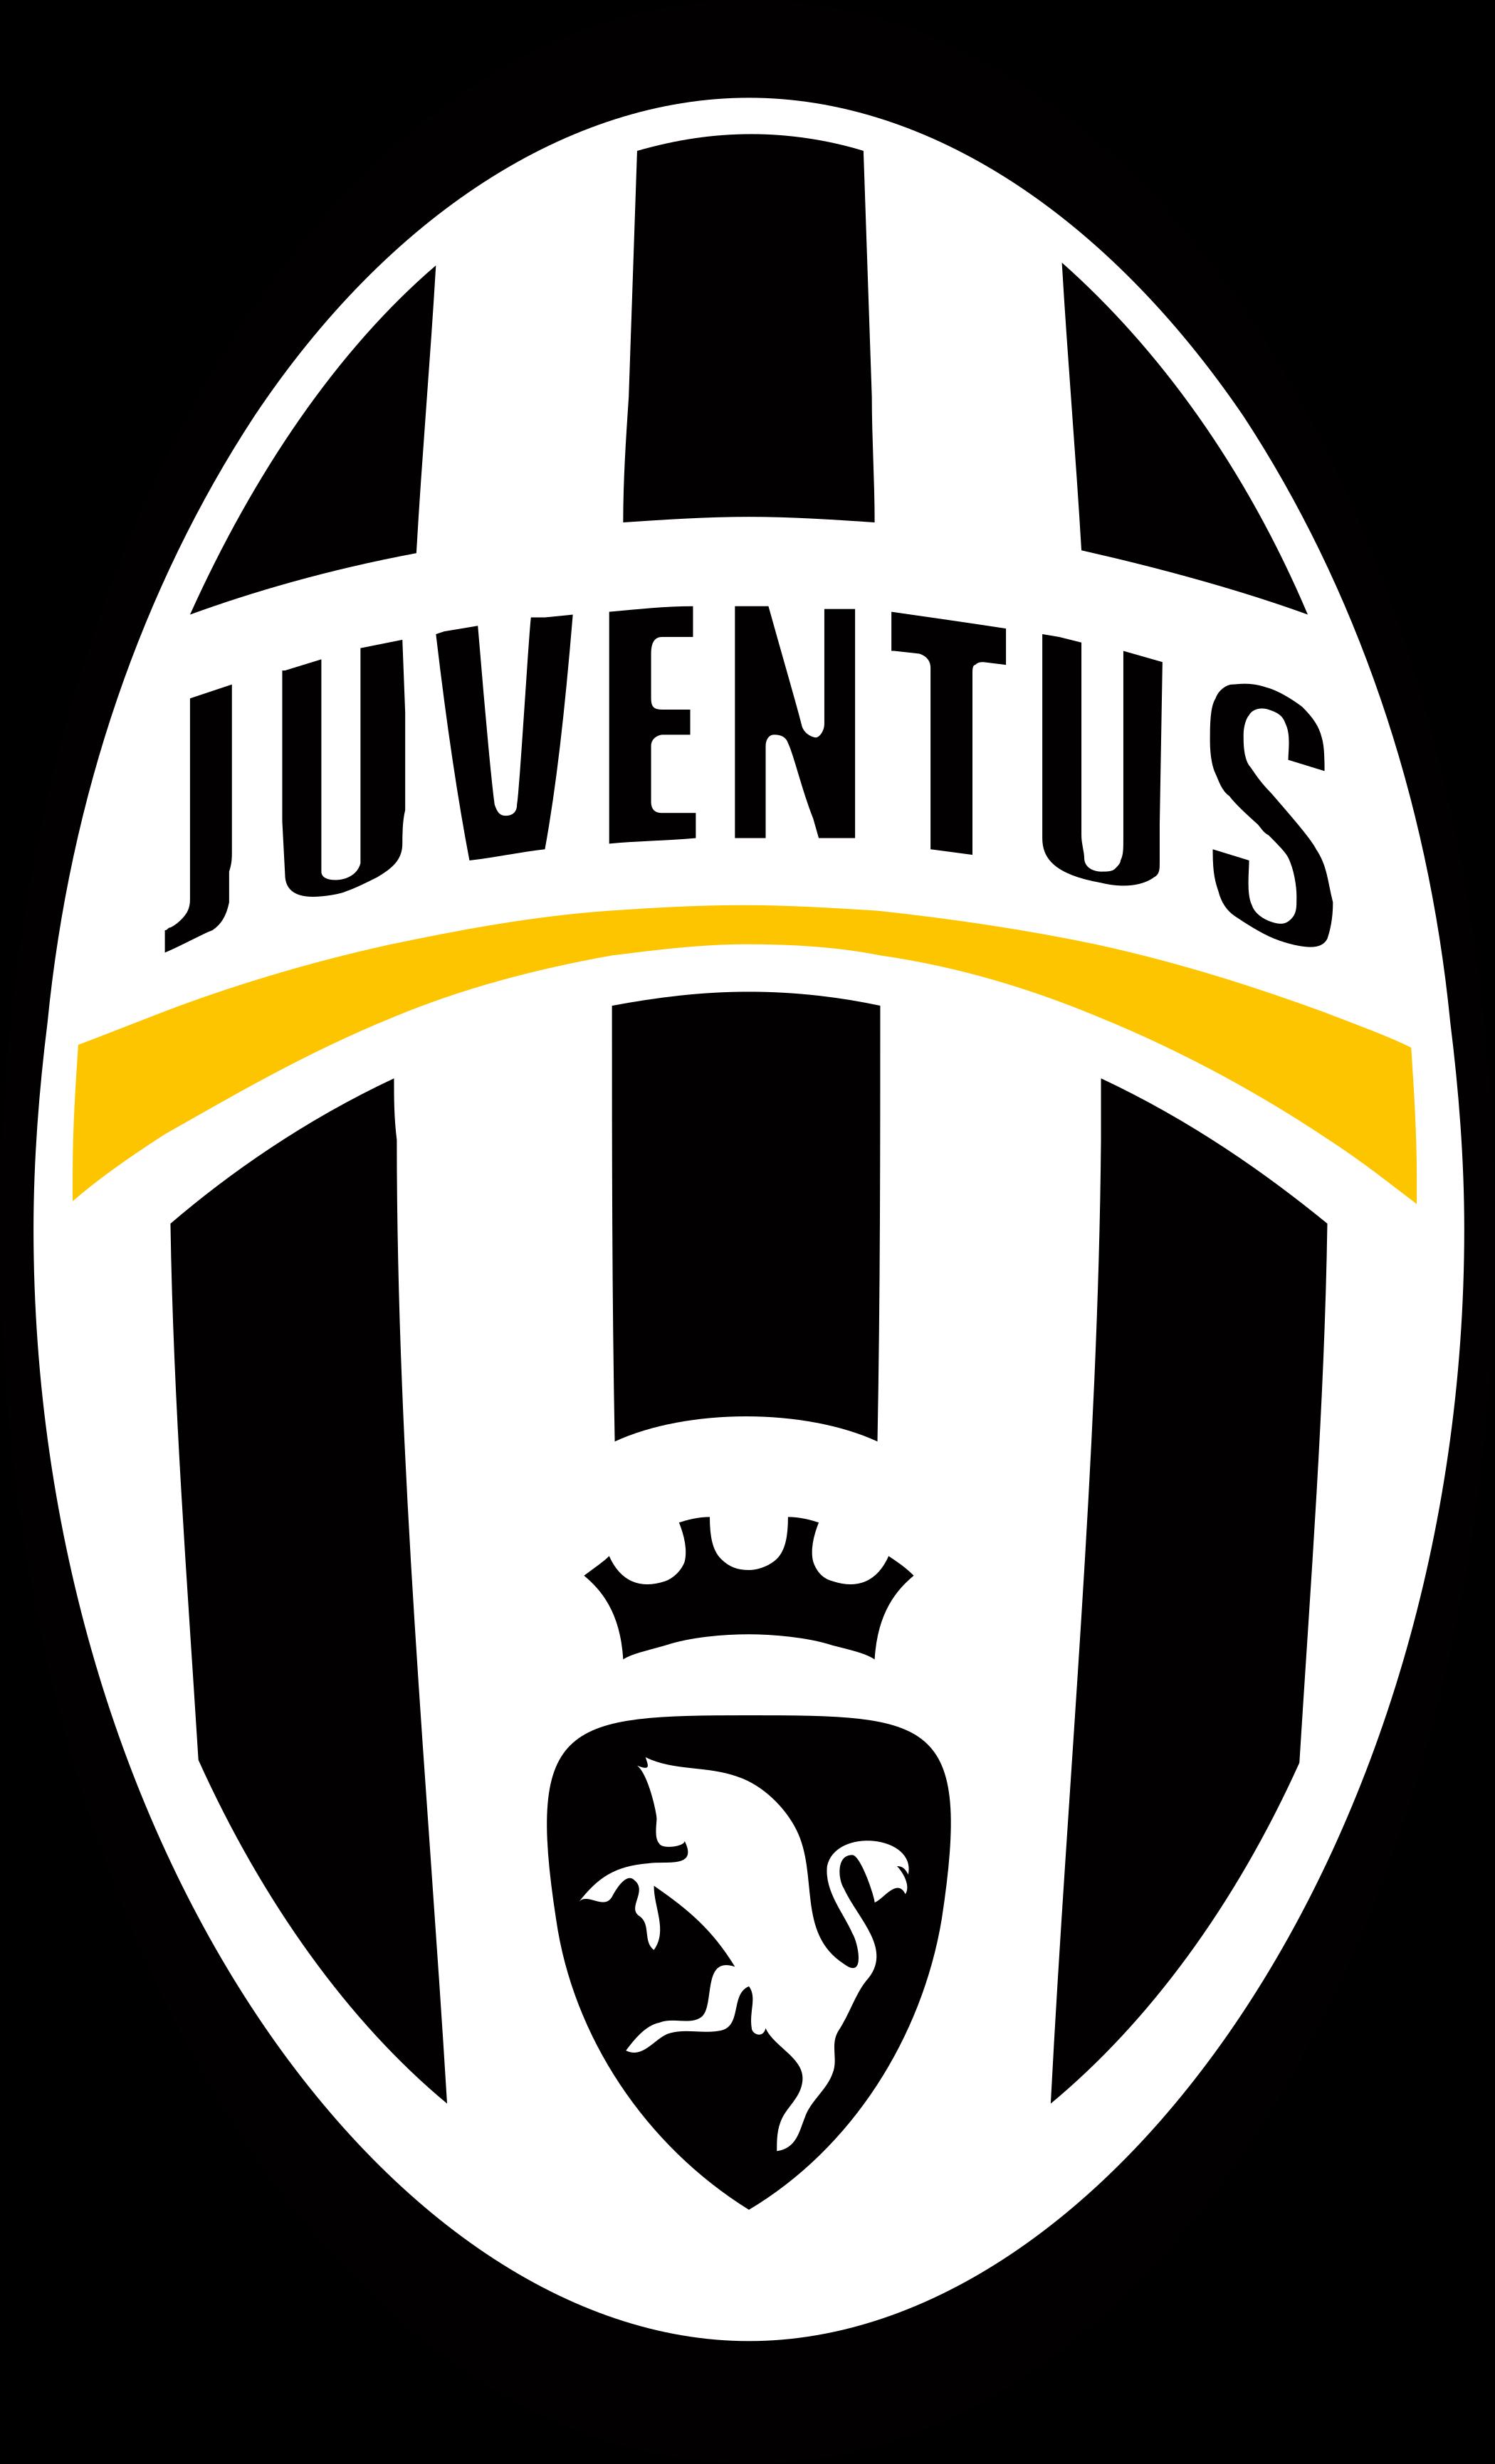 juventus turim logo escudo 1 - Juventus Logo - Escudo